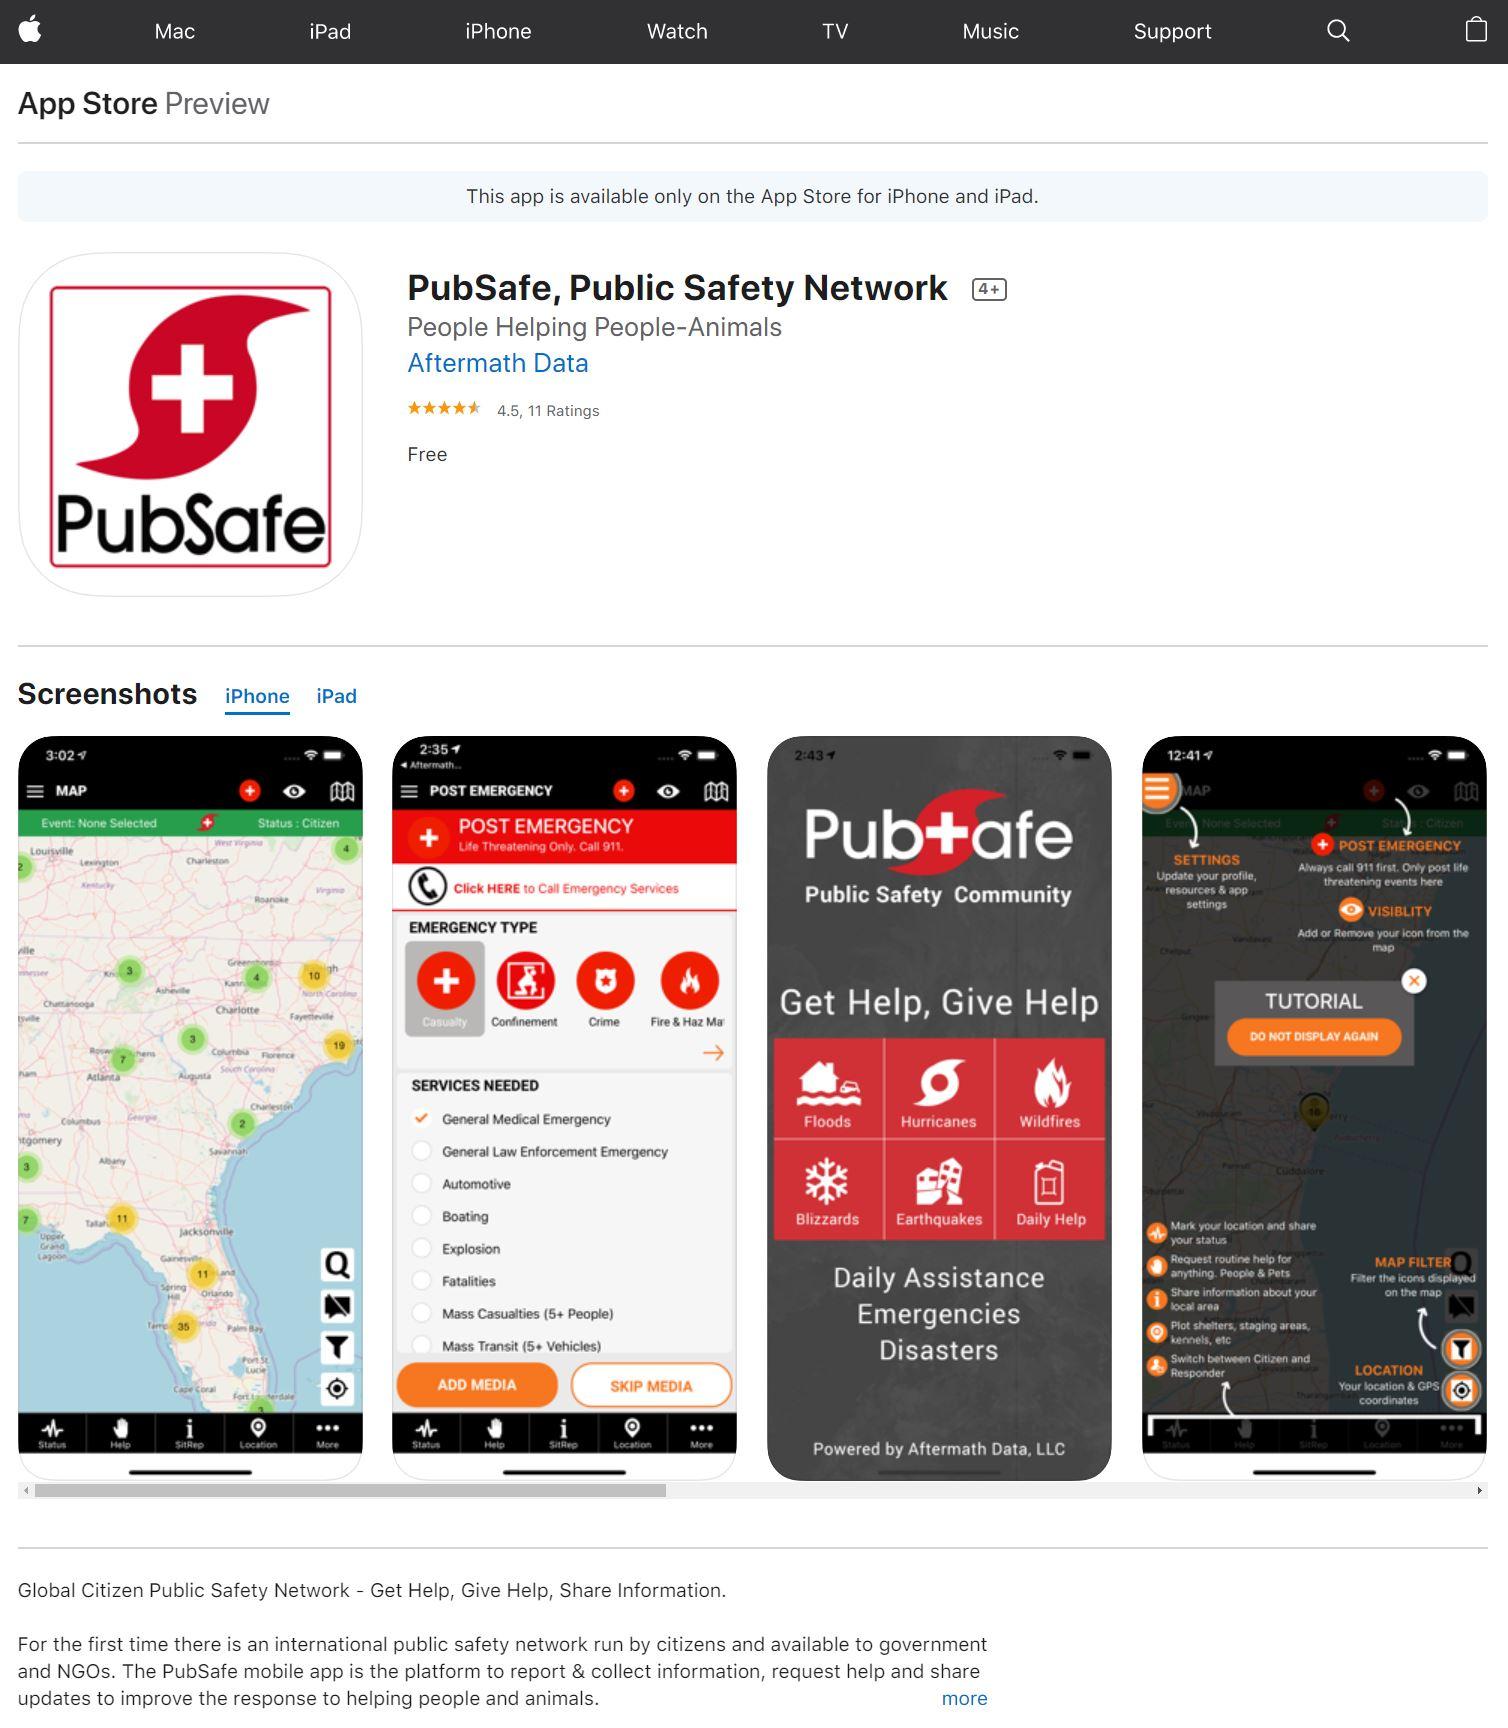 PubSafe Public Safety Community Mobile App